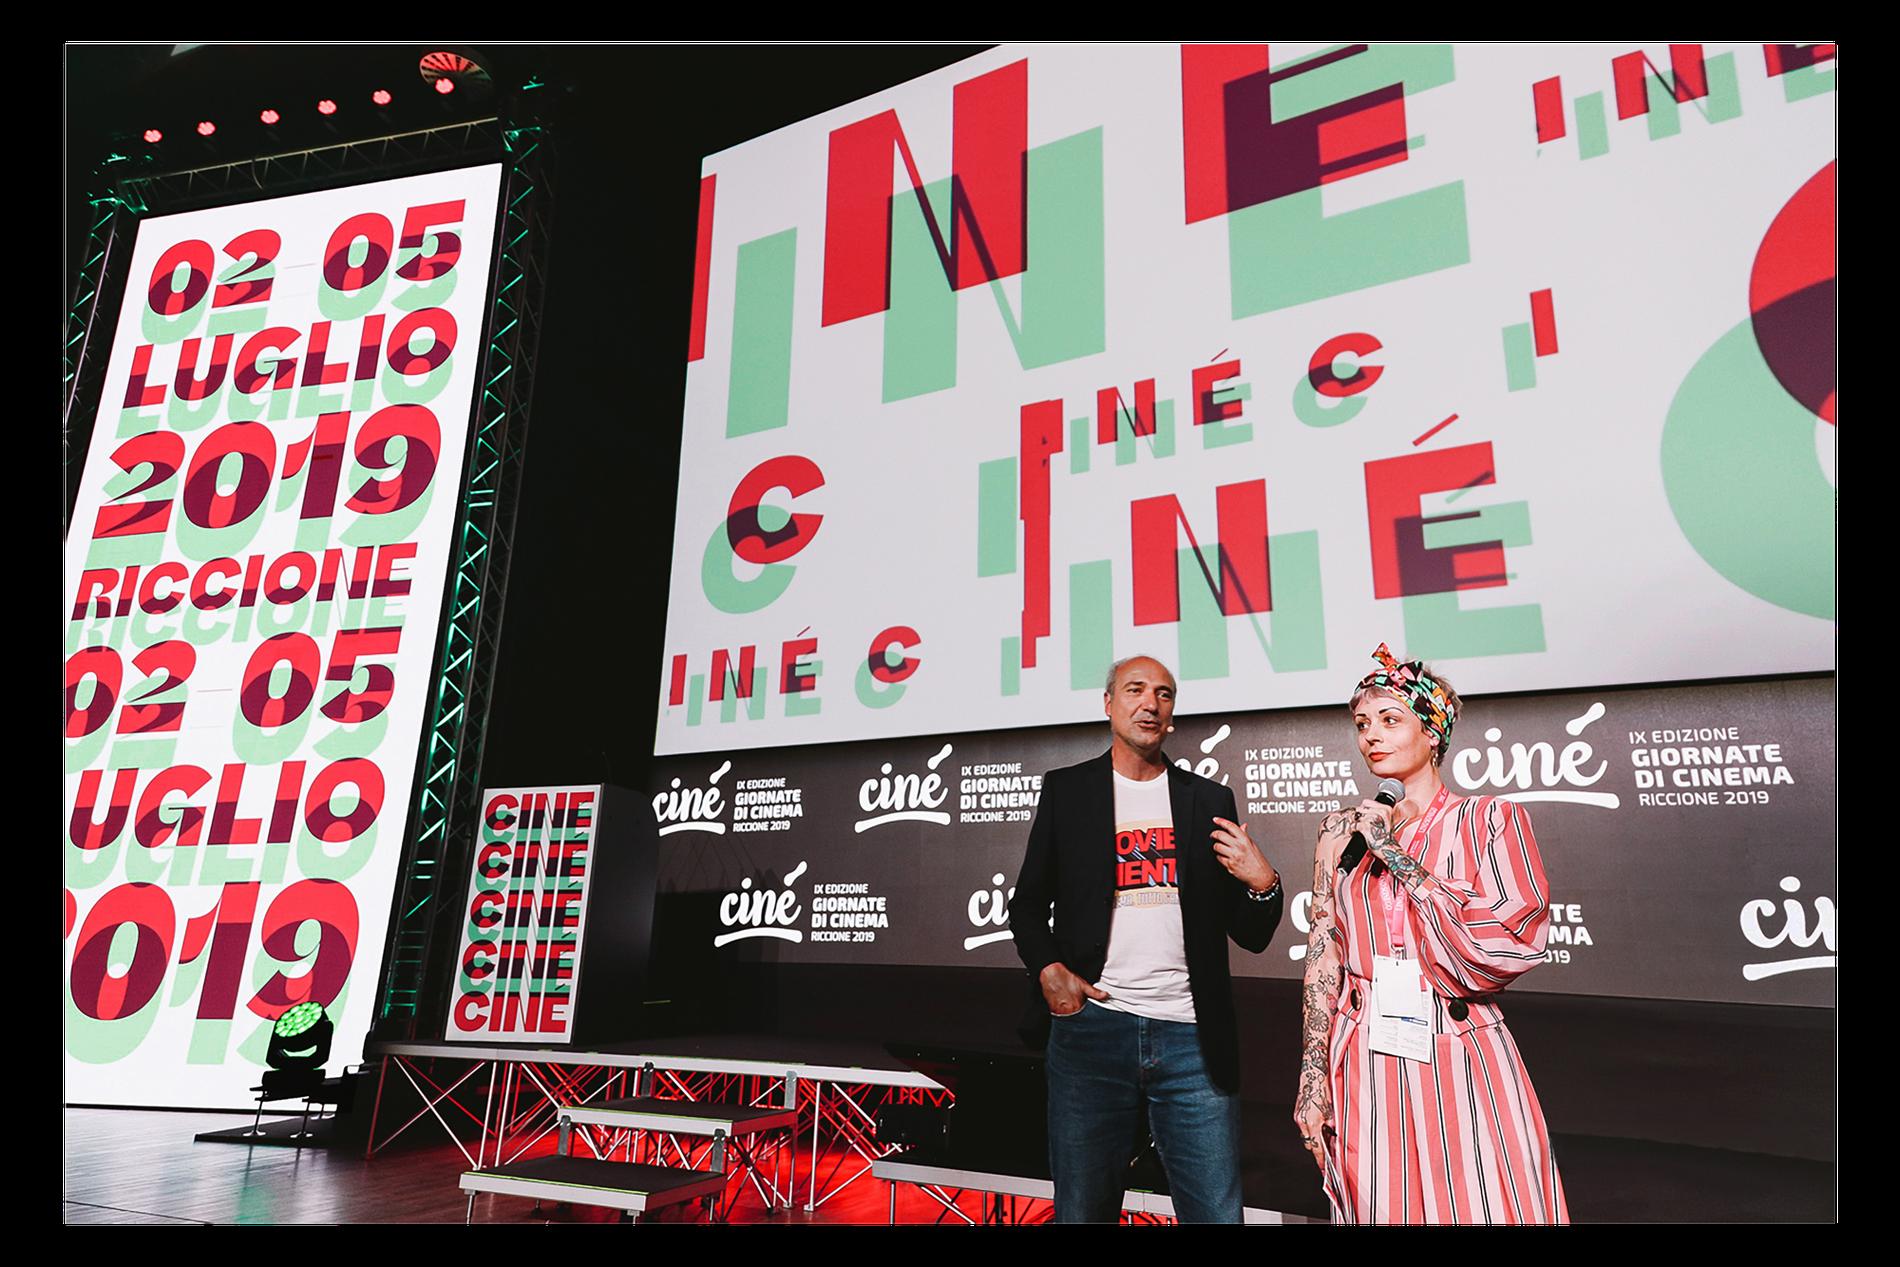 PaulaDelMas_Cine_cinema_festival_design_digital_3.jpg